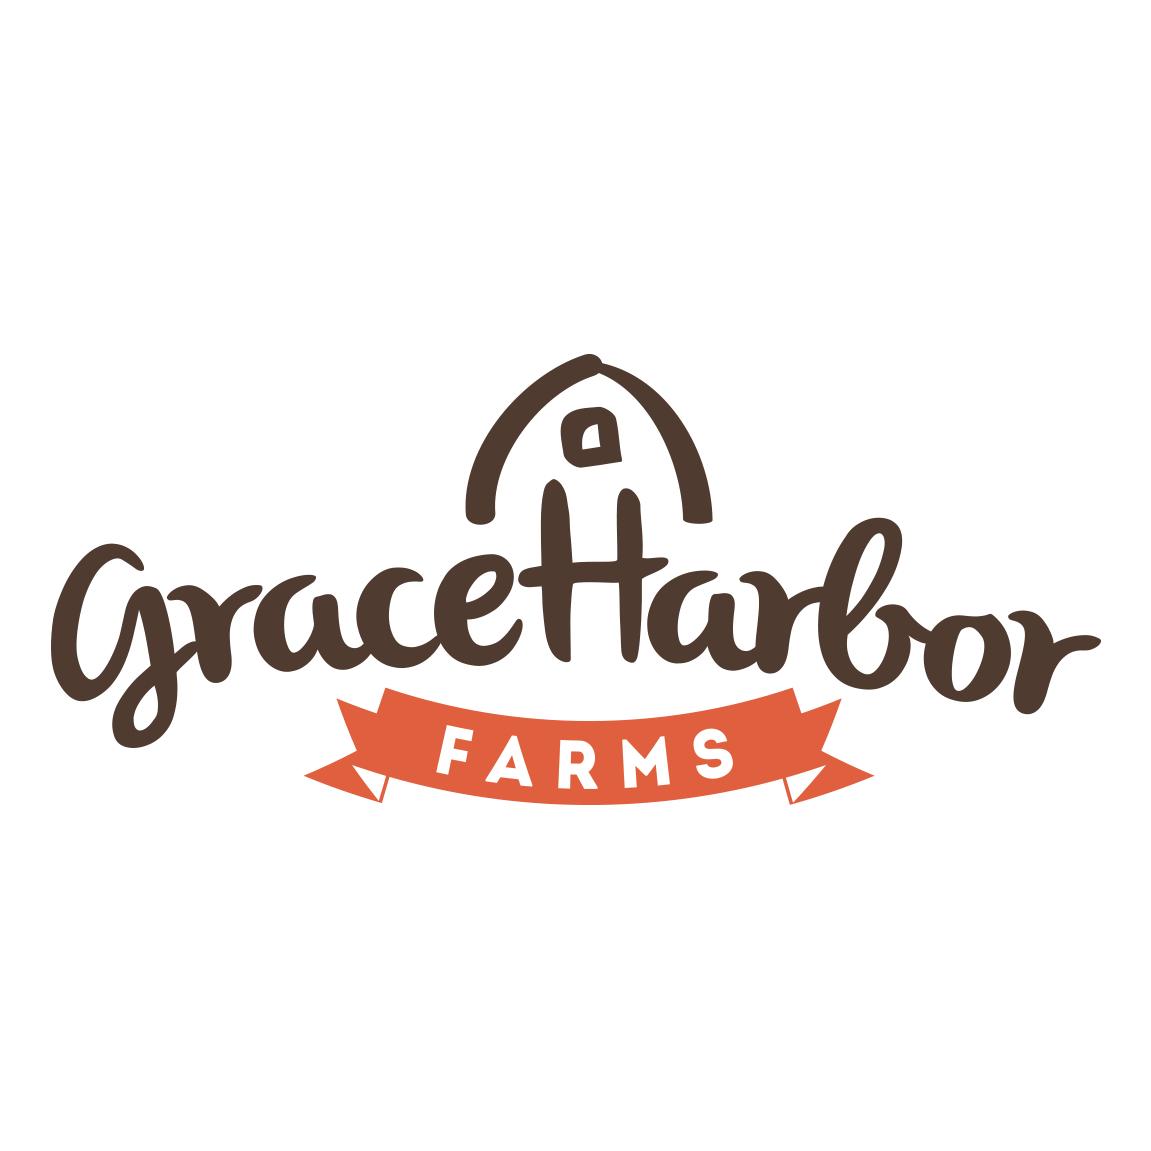 Grace Harbor Farms